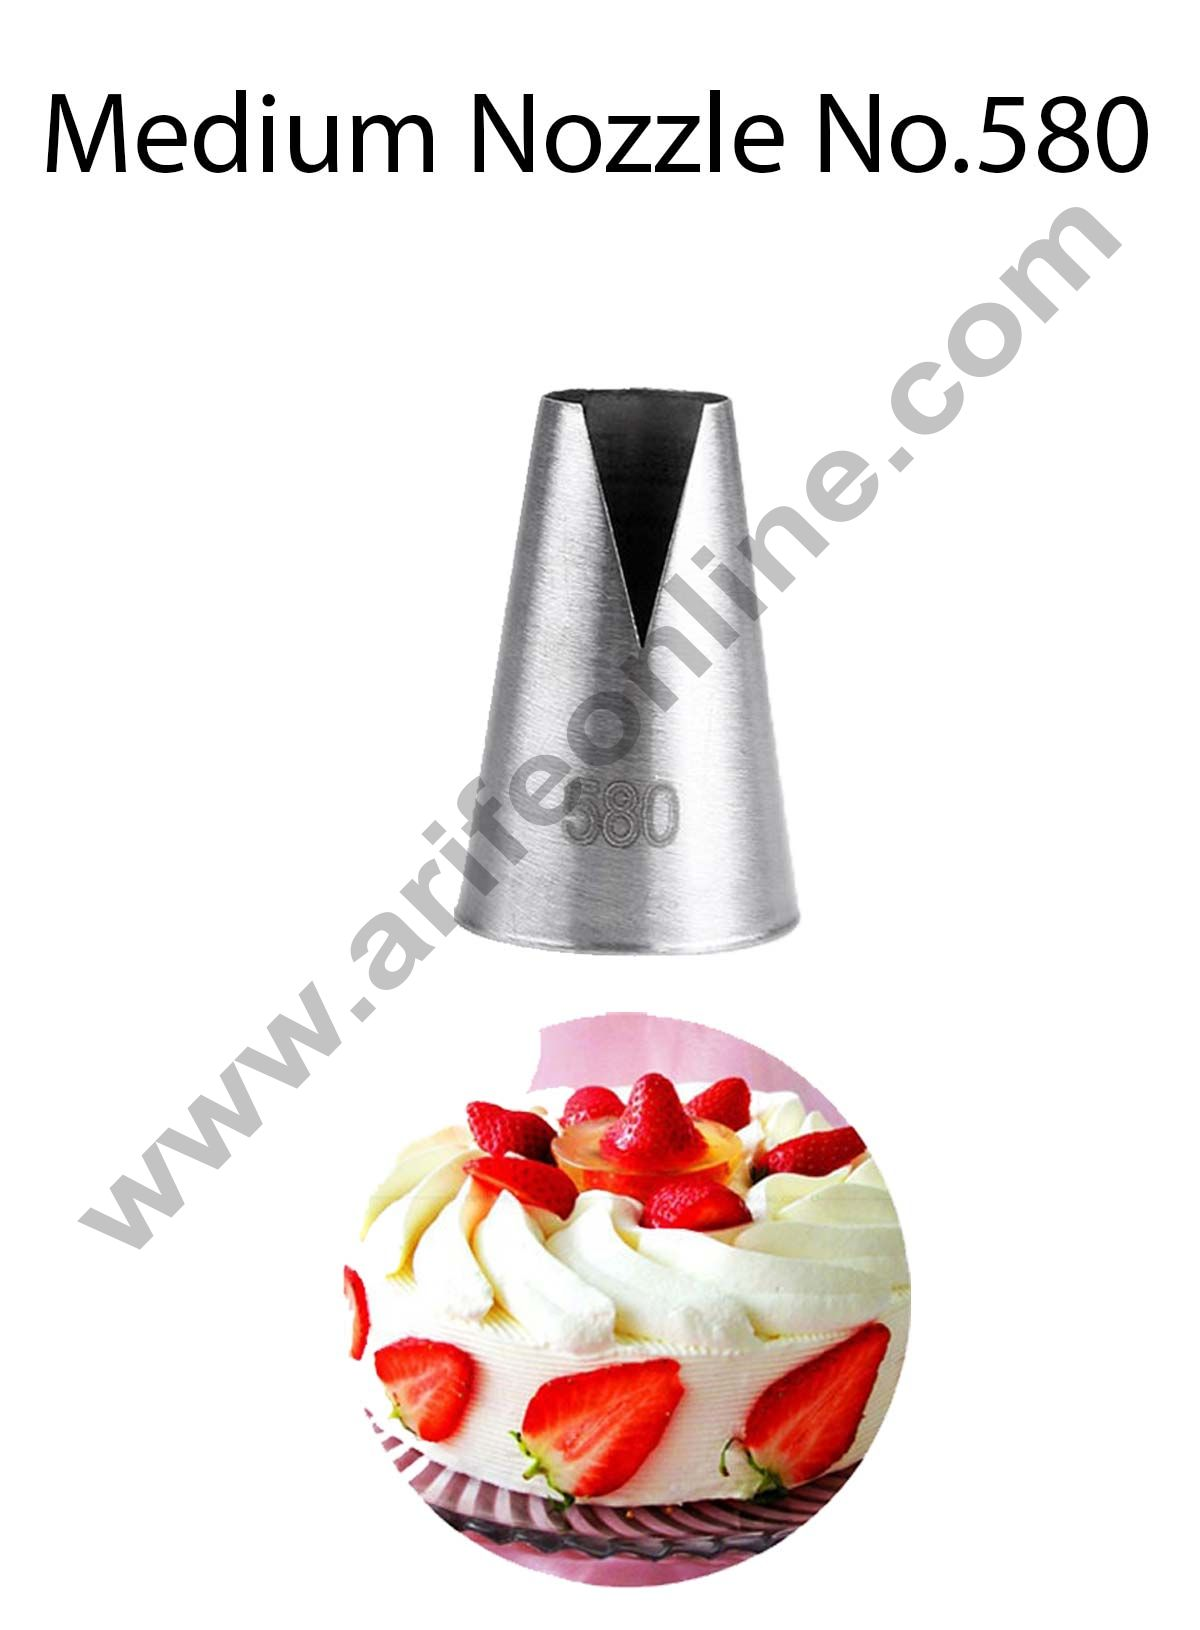 "Cake Decor Medium Nozzle - No. 580 Medium ""V"" Cut/Saint Honore Piping Nozzle"